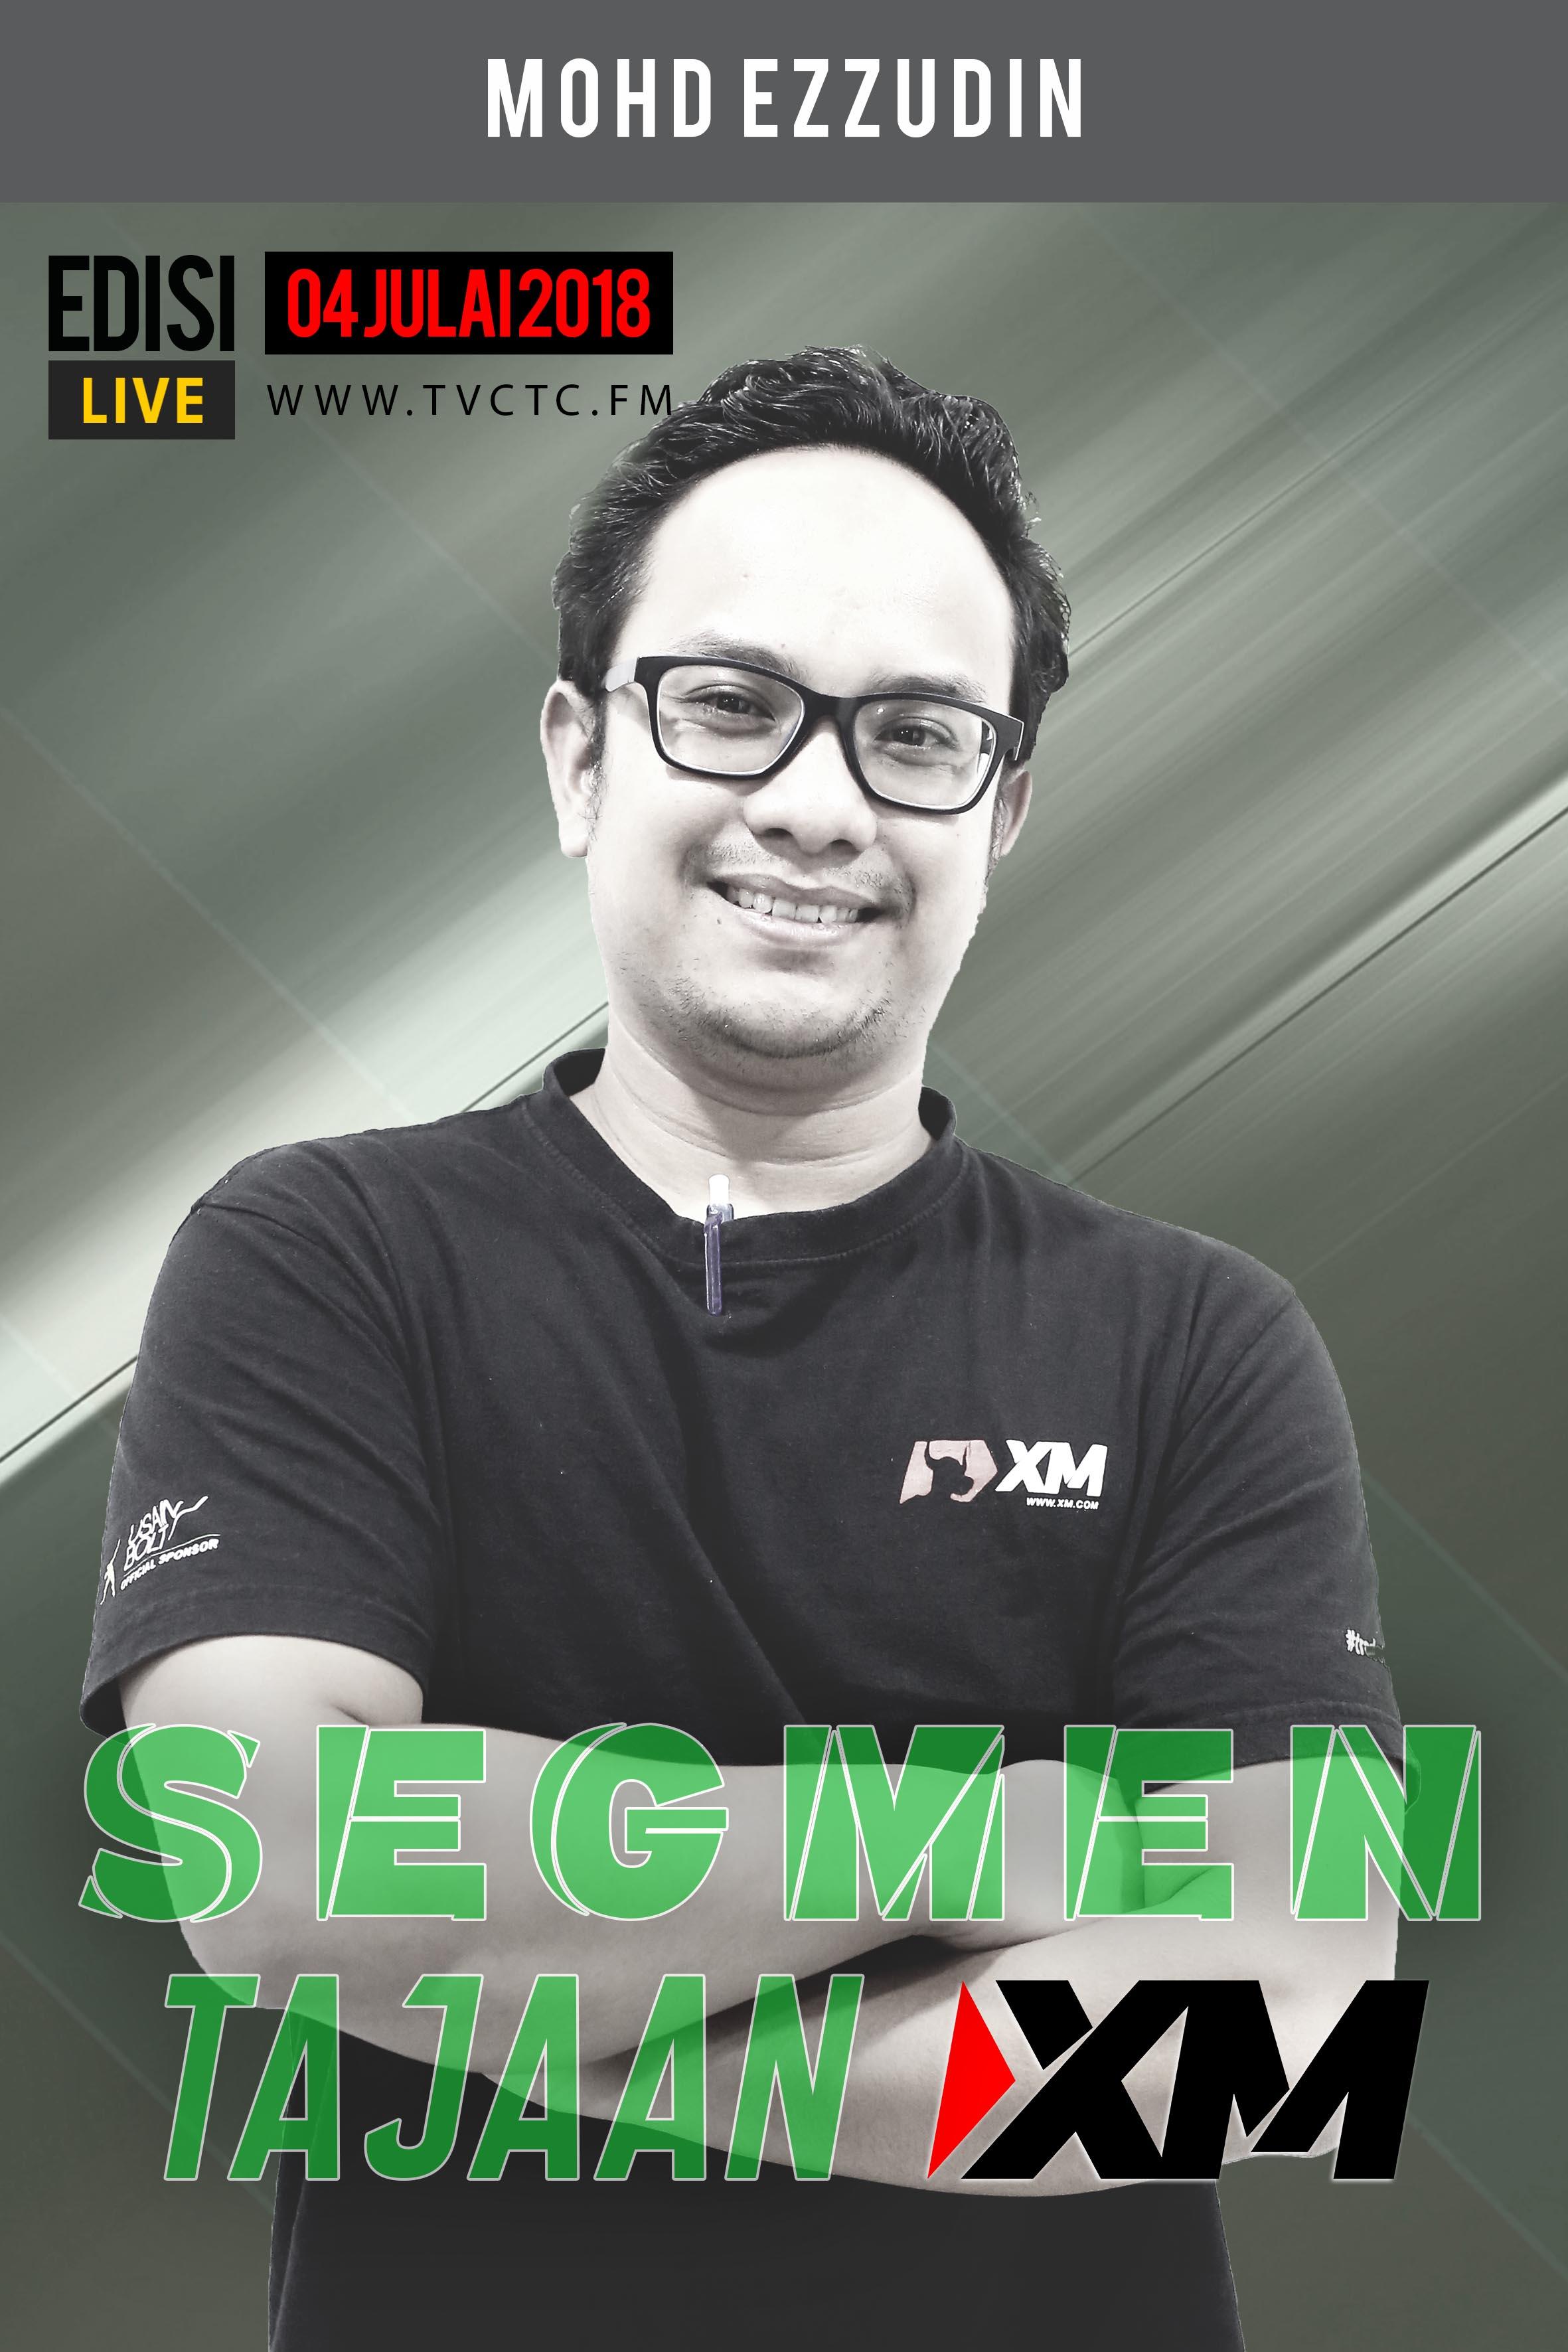 SEGMEN TAJAAN : Tajaan XM (Mohd Ezzudin XM)